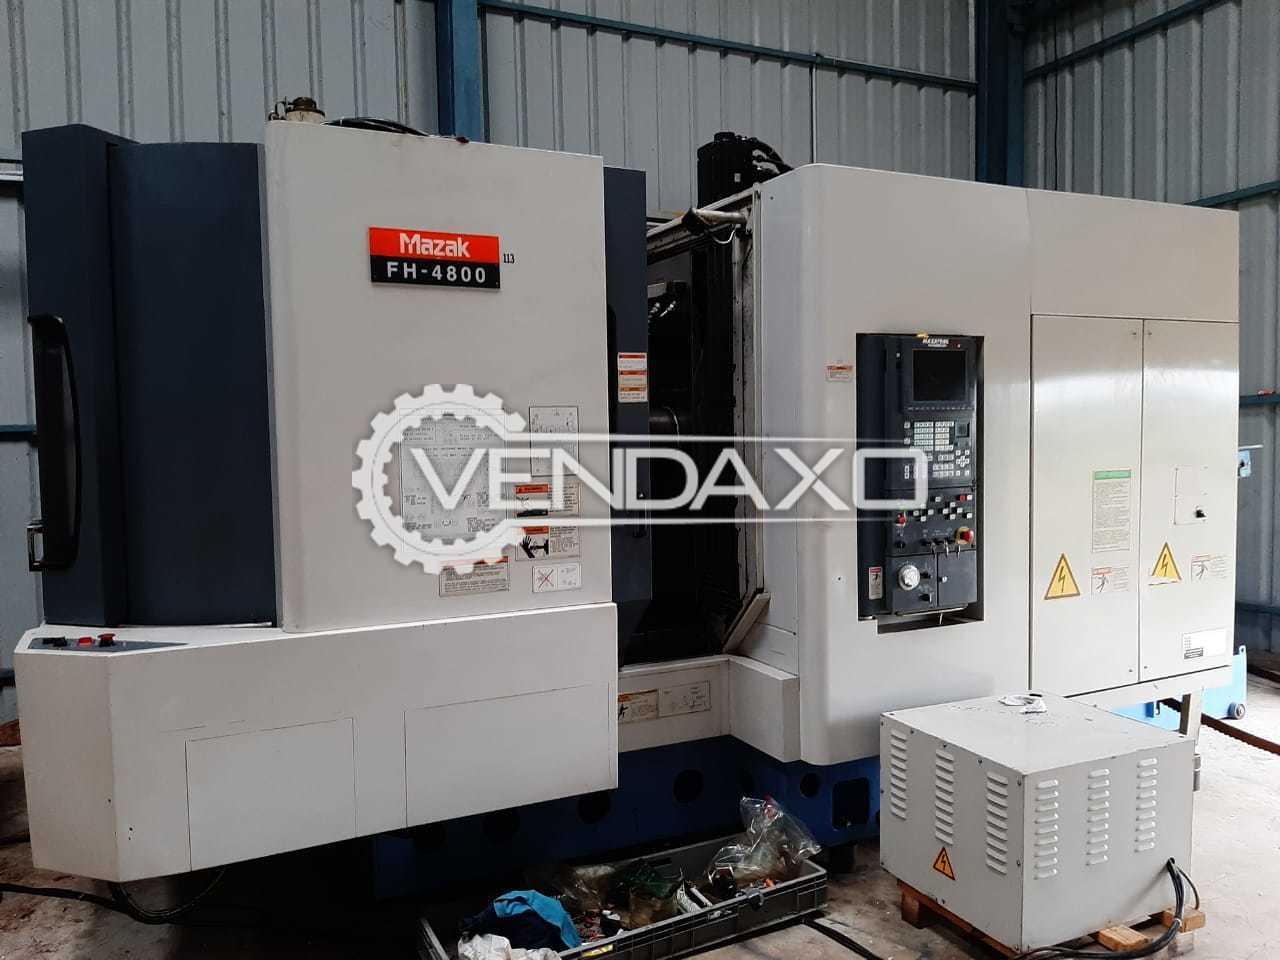 MAZAK FH4800 CNC Horizontal Machining Center HMC - Table Size - 400 x 400 mm